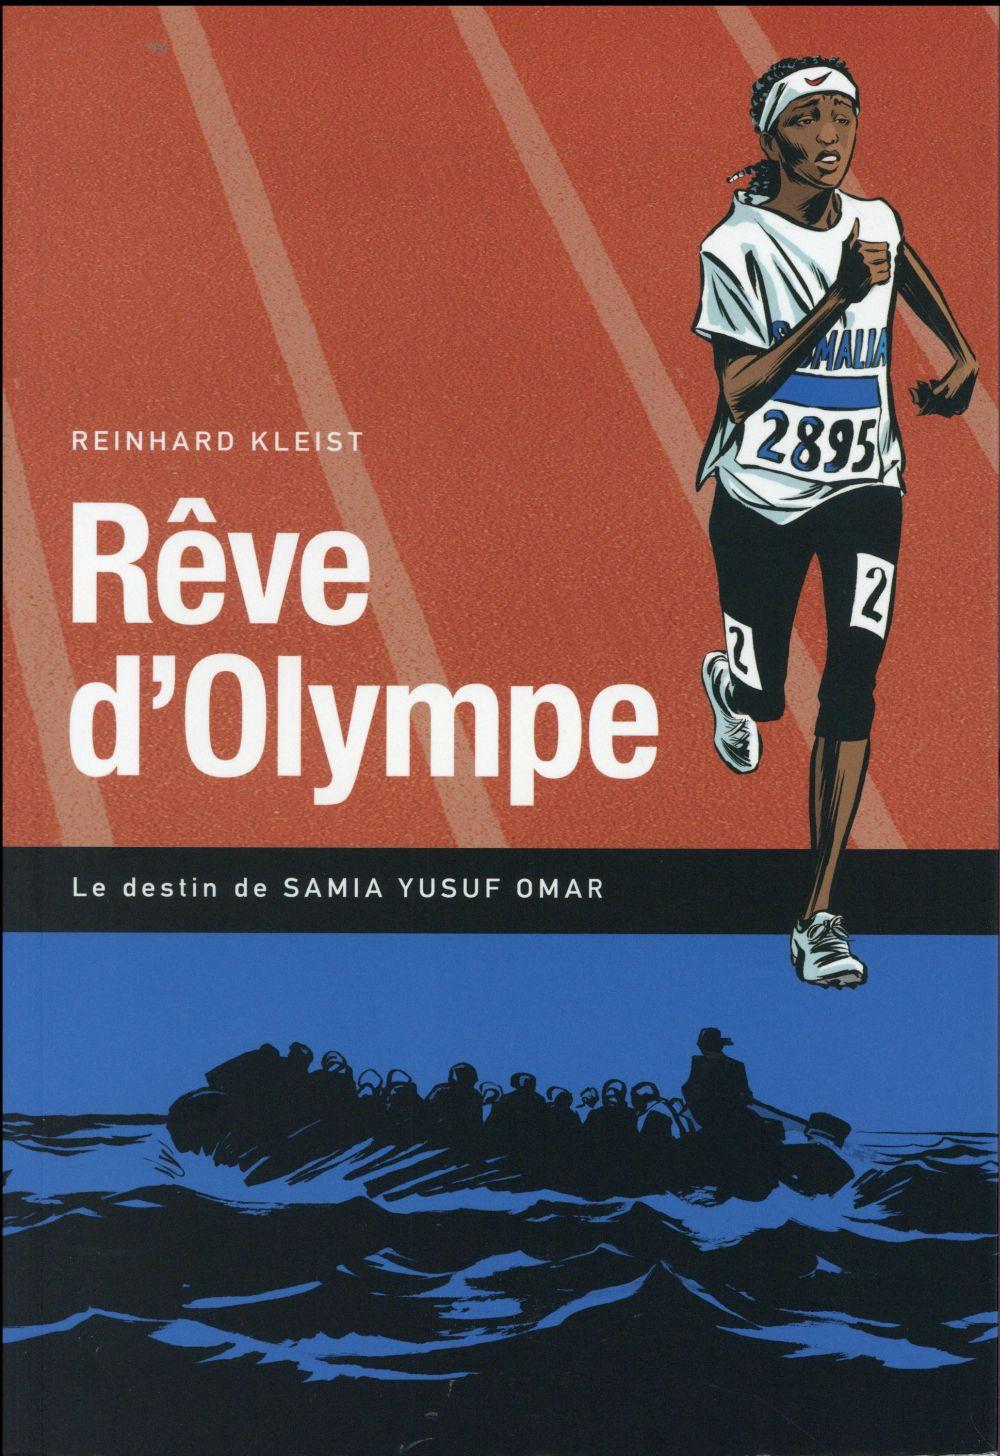 Reve d'Olympe